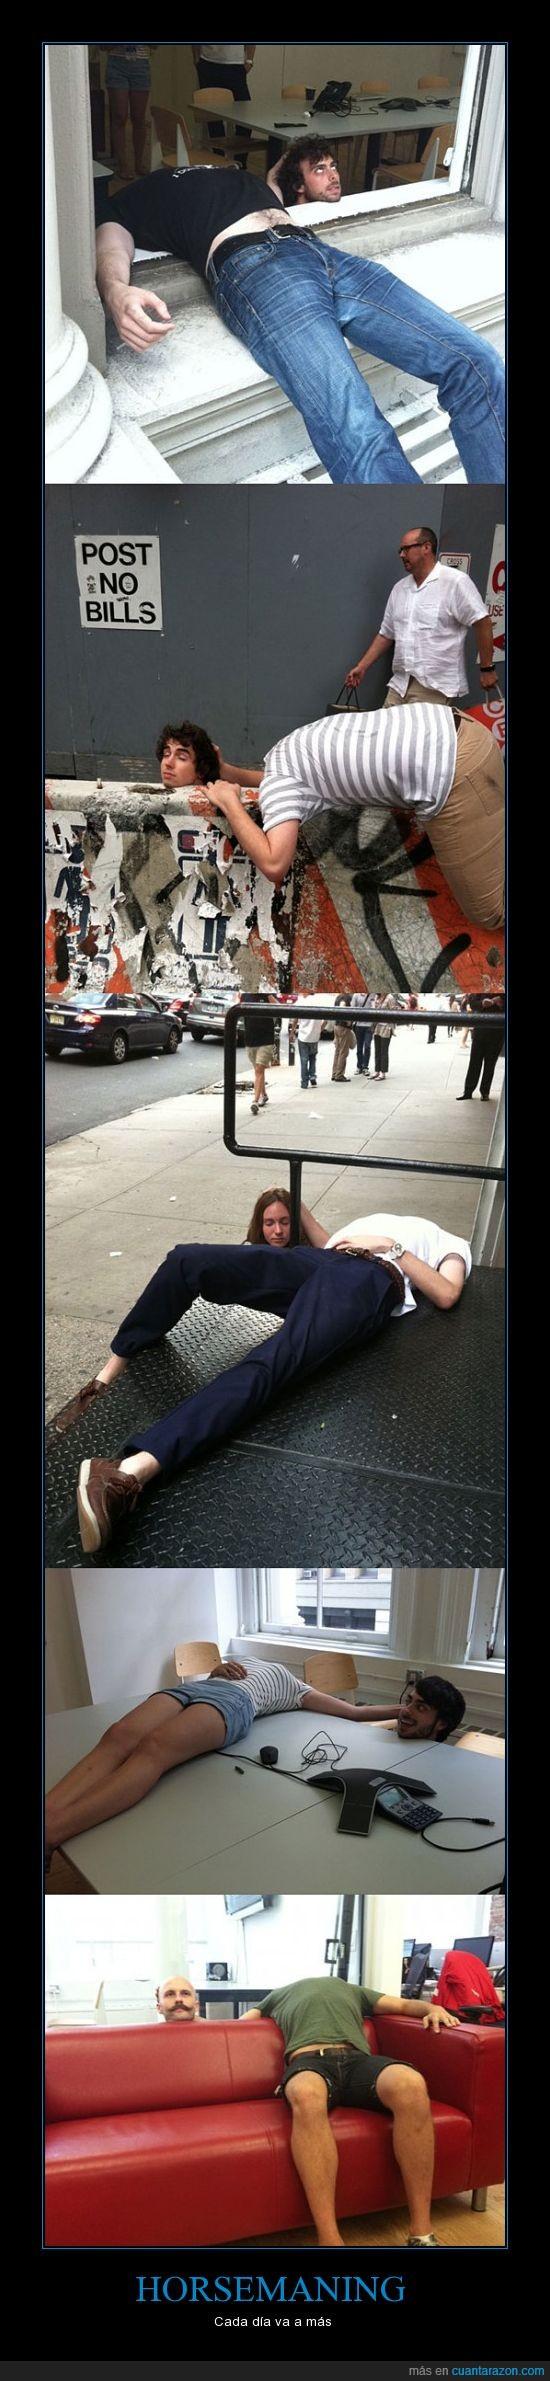 horsemaning,planking